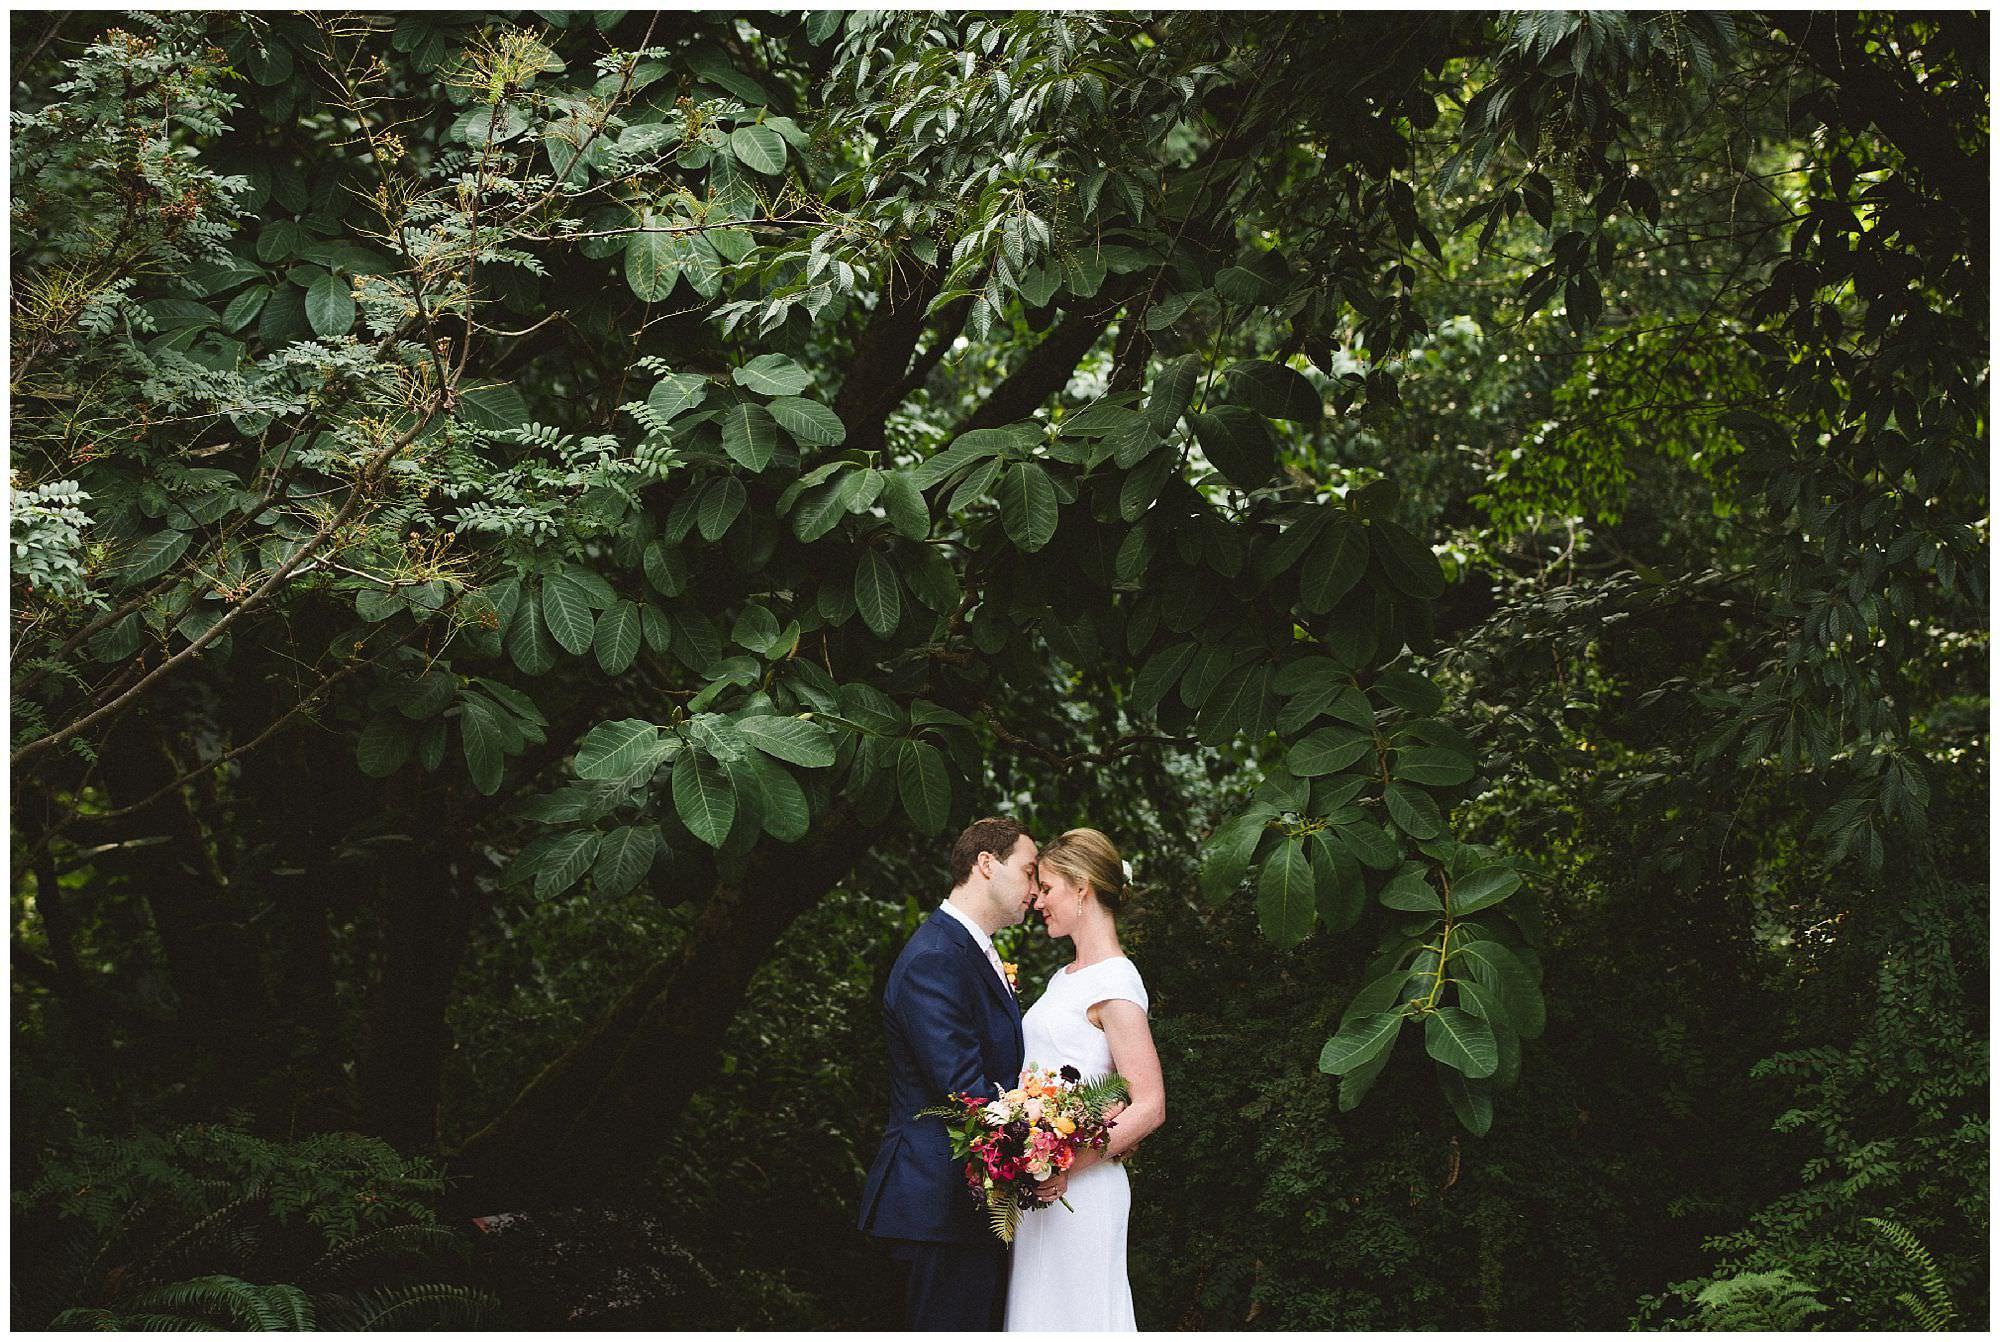 romantic wedding portrait at UBC Botanical Gardens, outdoor wedding, BC wedding photographer